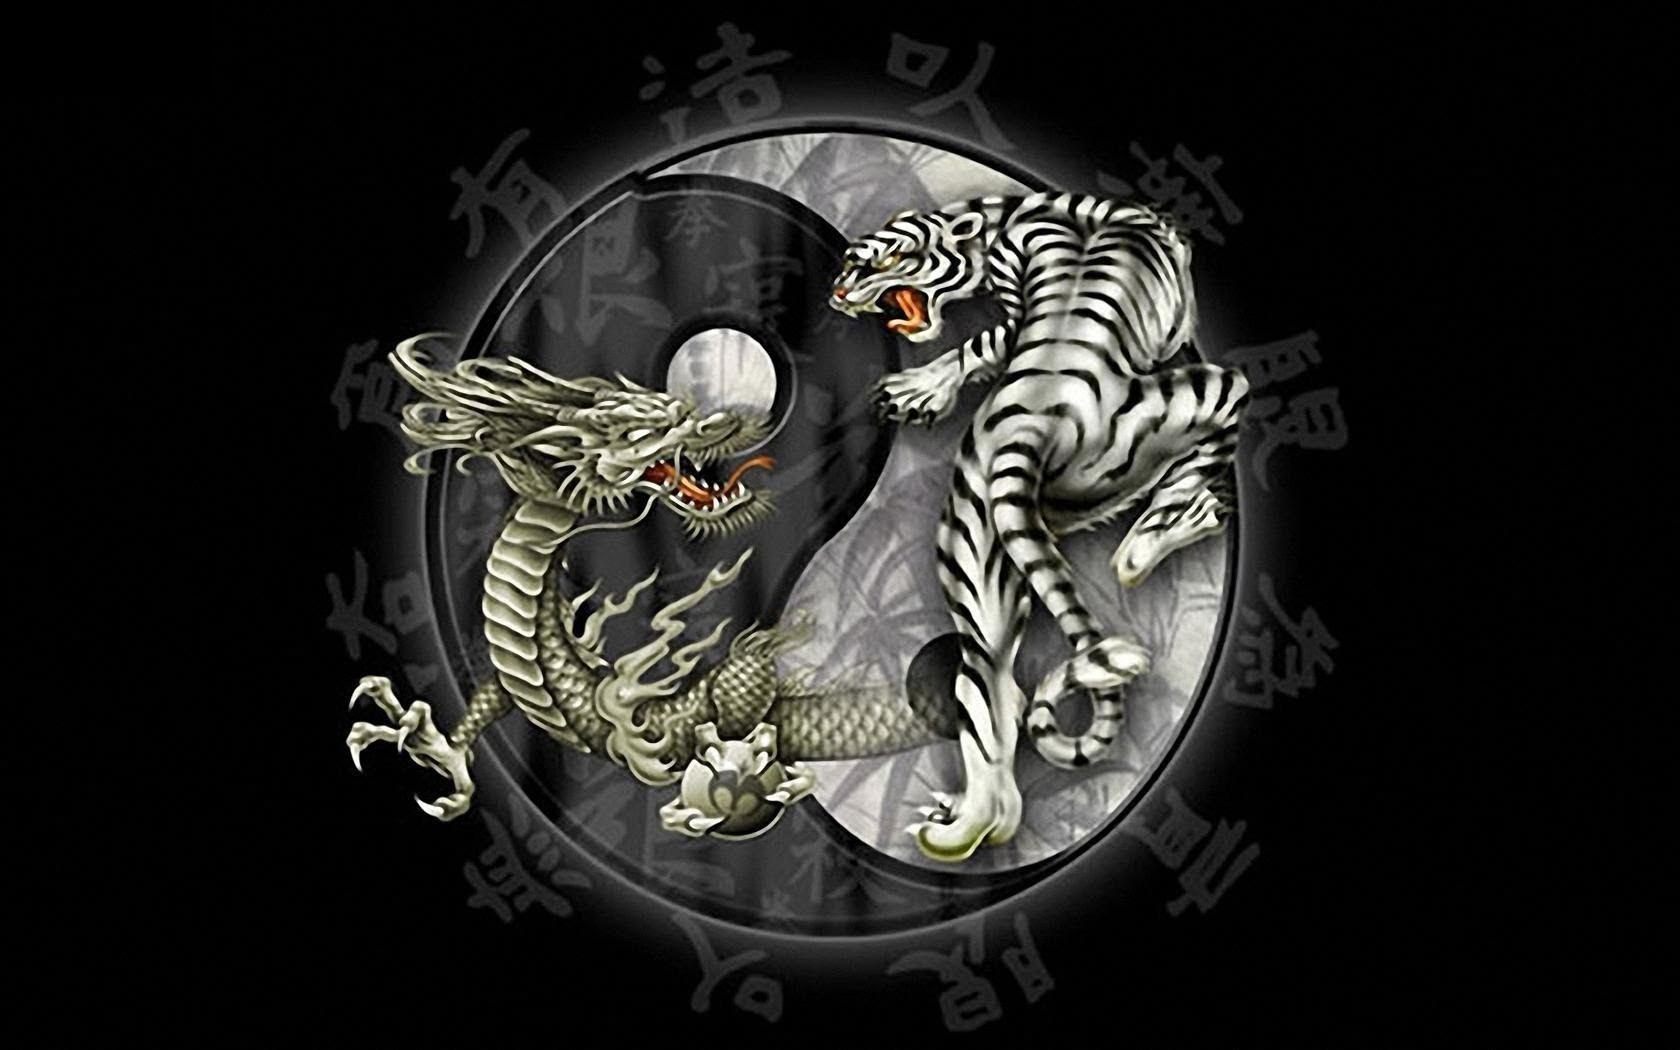 Shotokan Tiger Wallpapers Top Free Shotokan Tiger